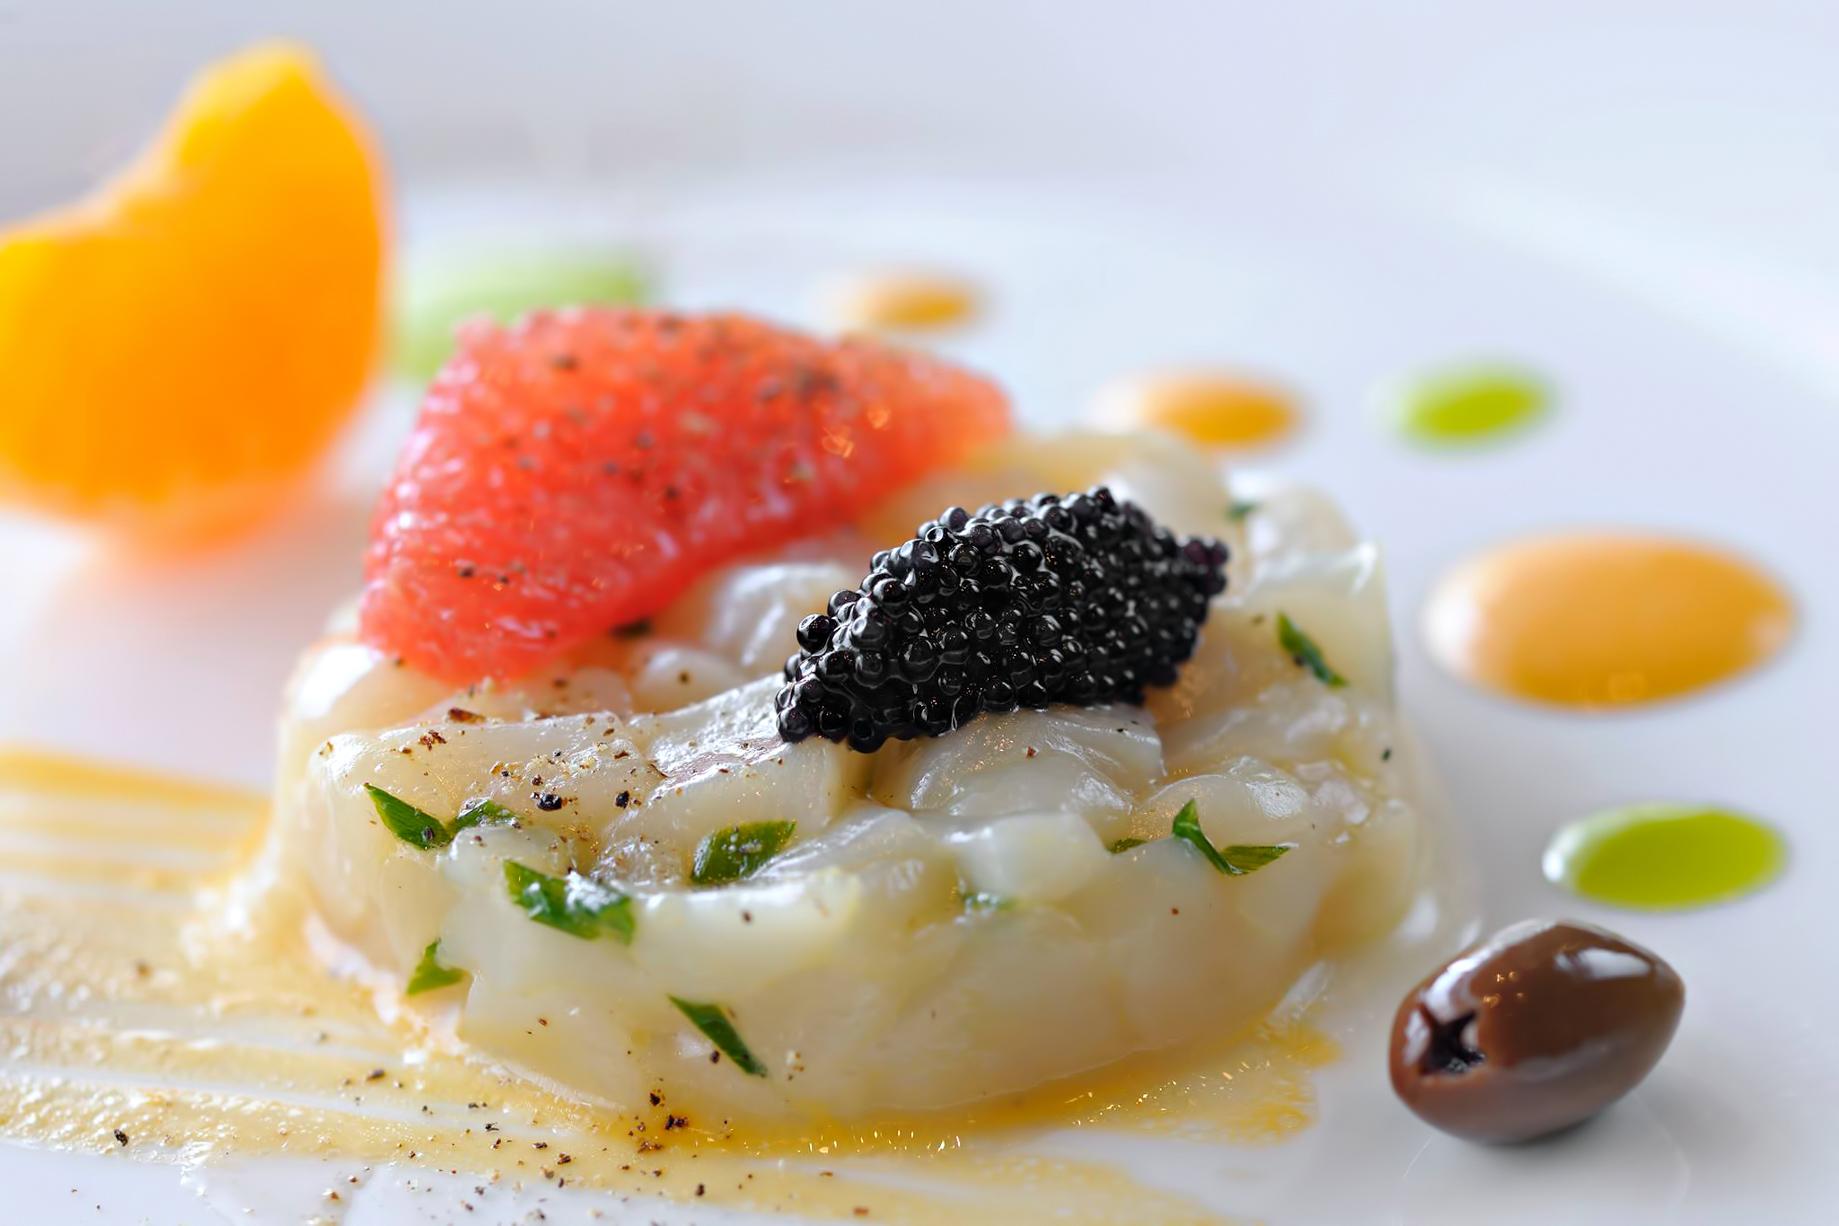 Armani Hotel Dubai - Burj Khalifa, Dubaï, Émirats arabes unis - Indulgence culinaire Armani